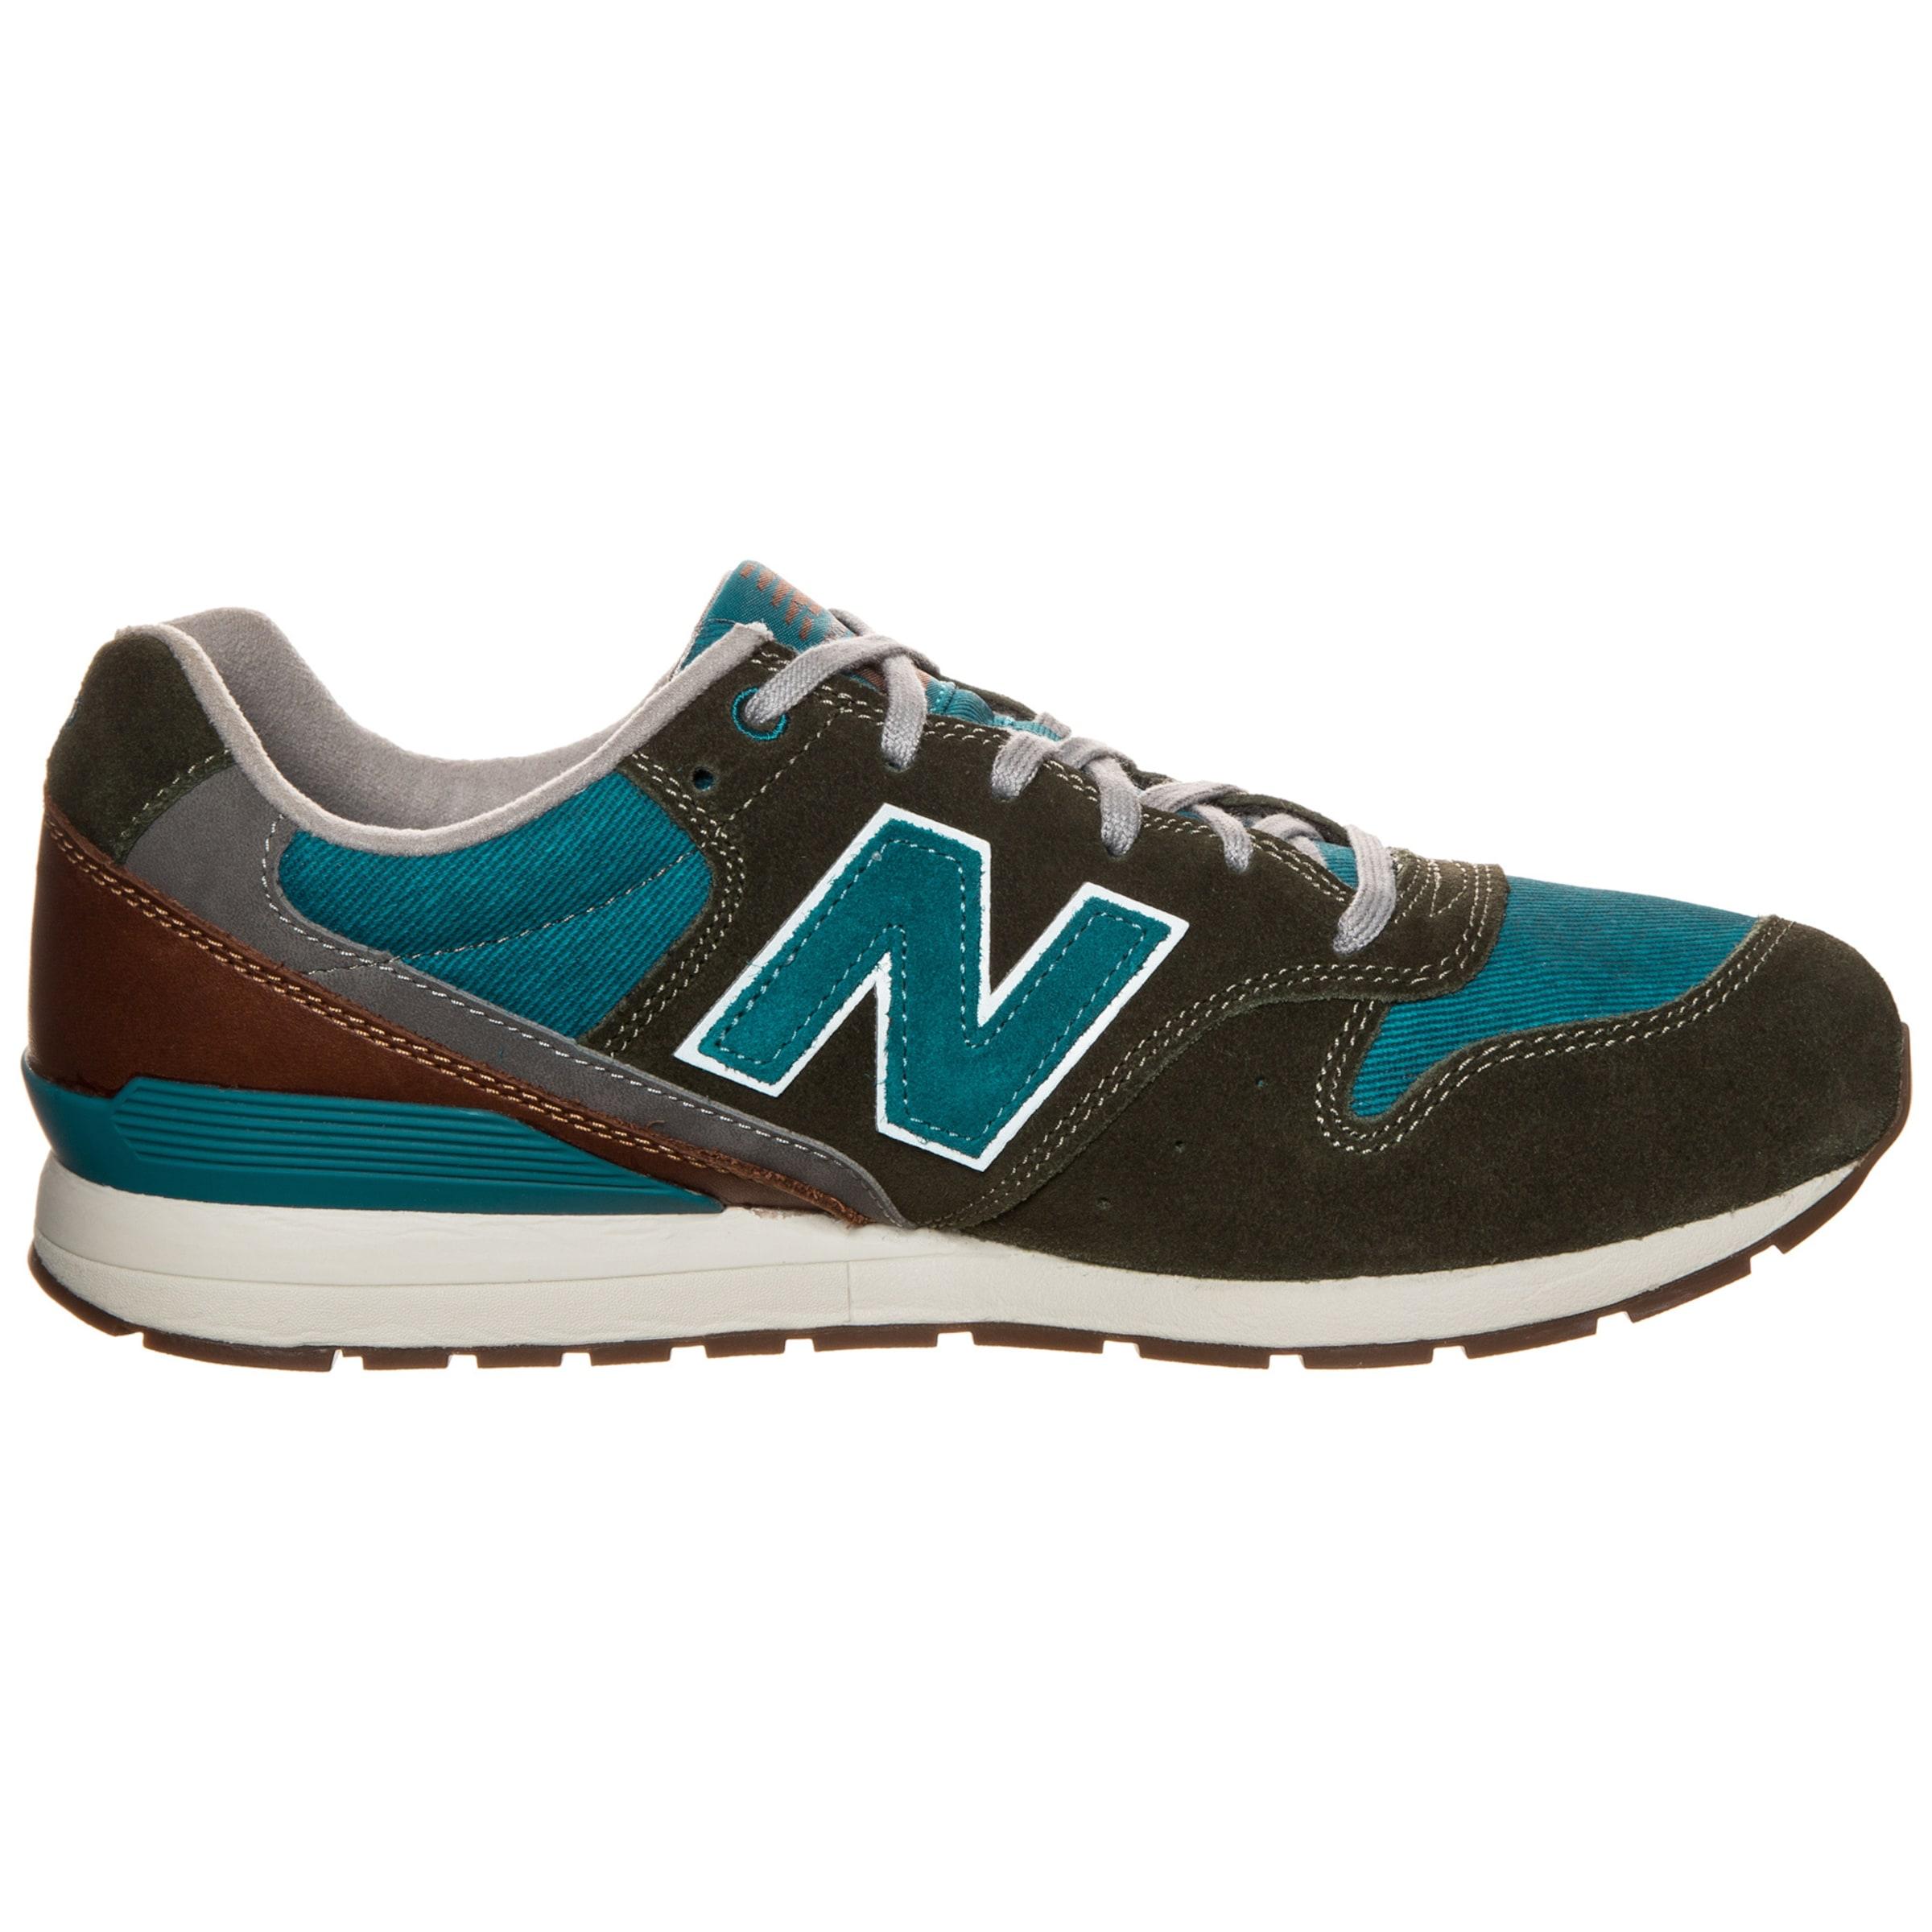 New Balance In Sneaker ne d Mrl996 Oliv EDeIYbHW29